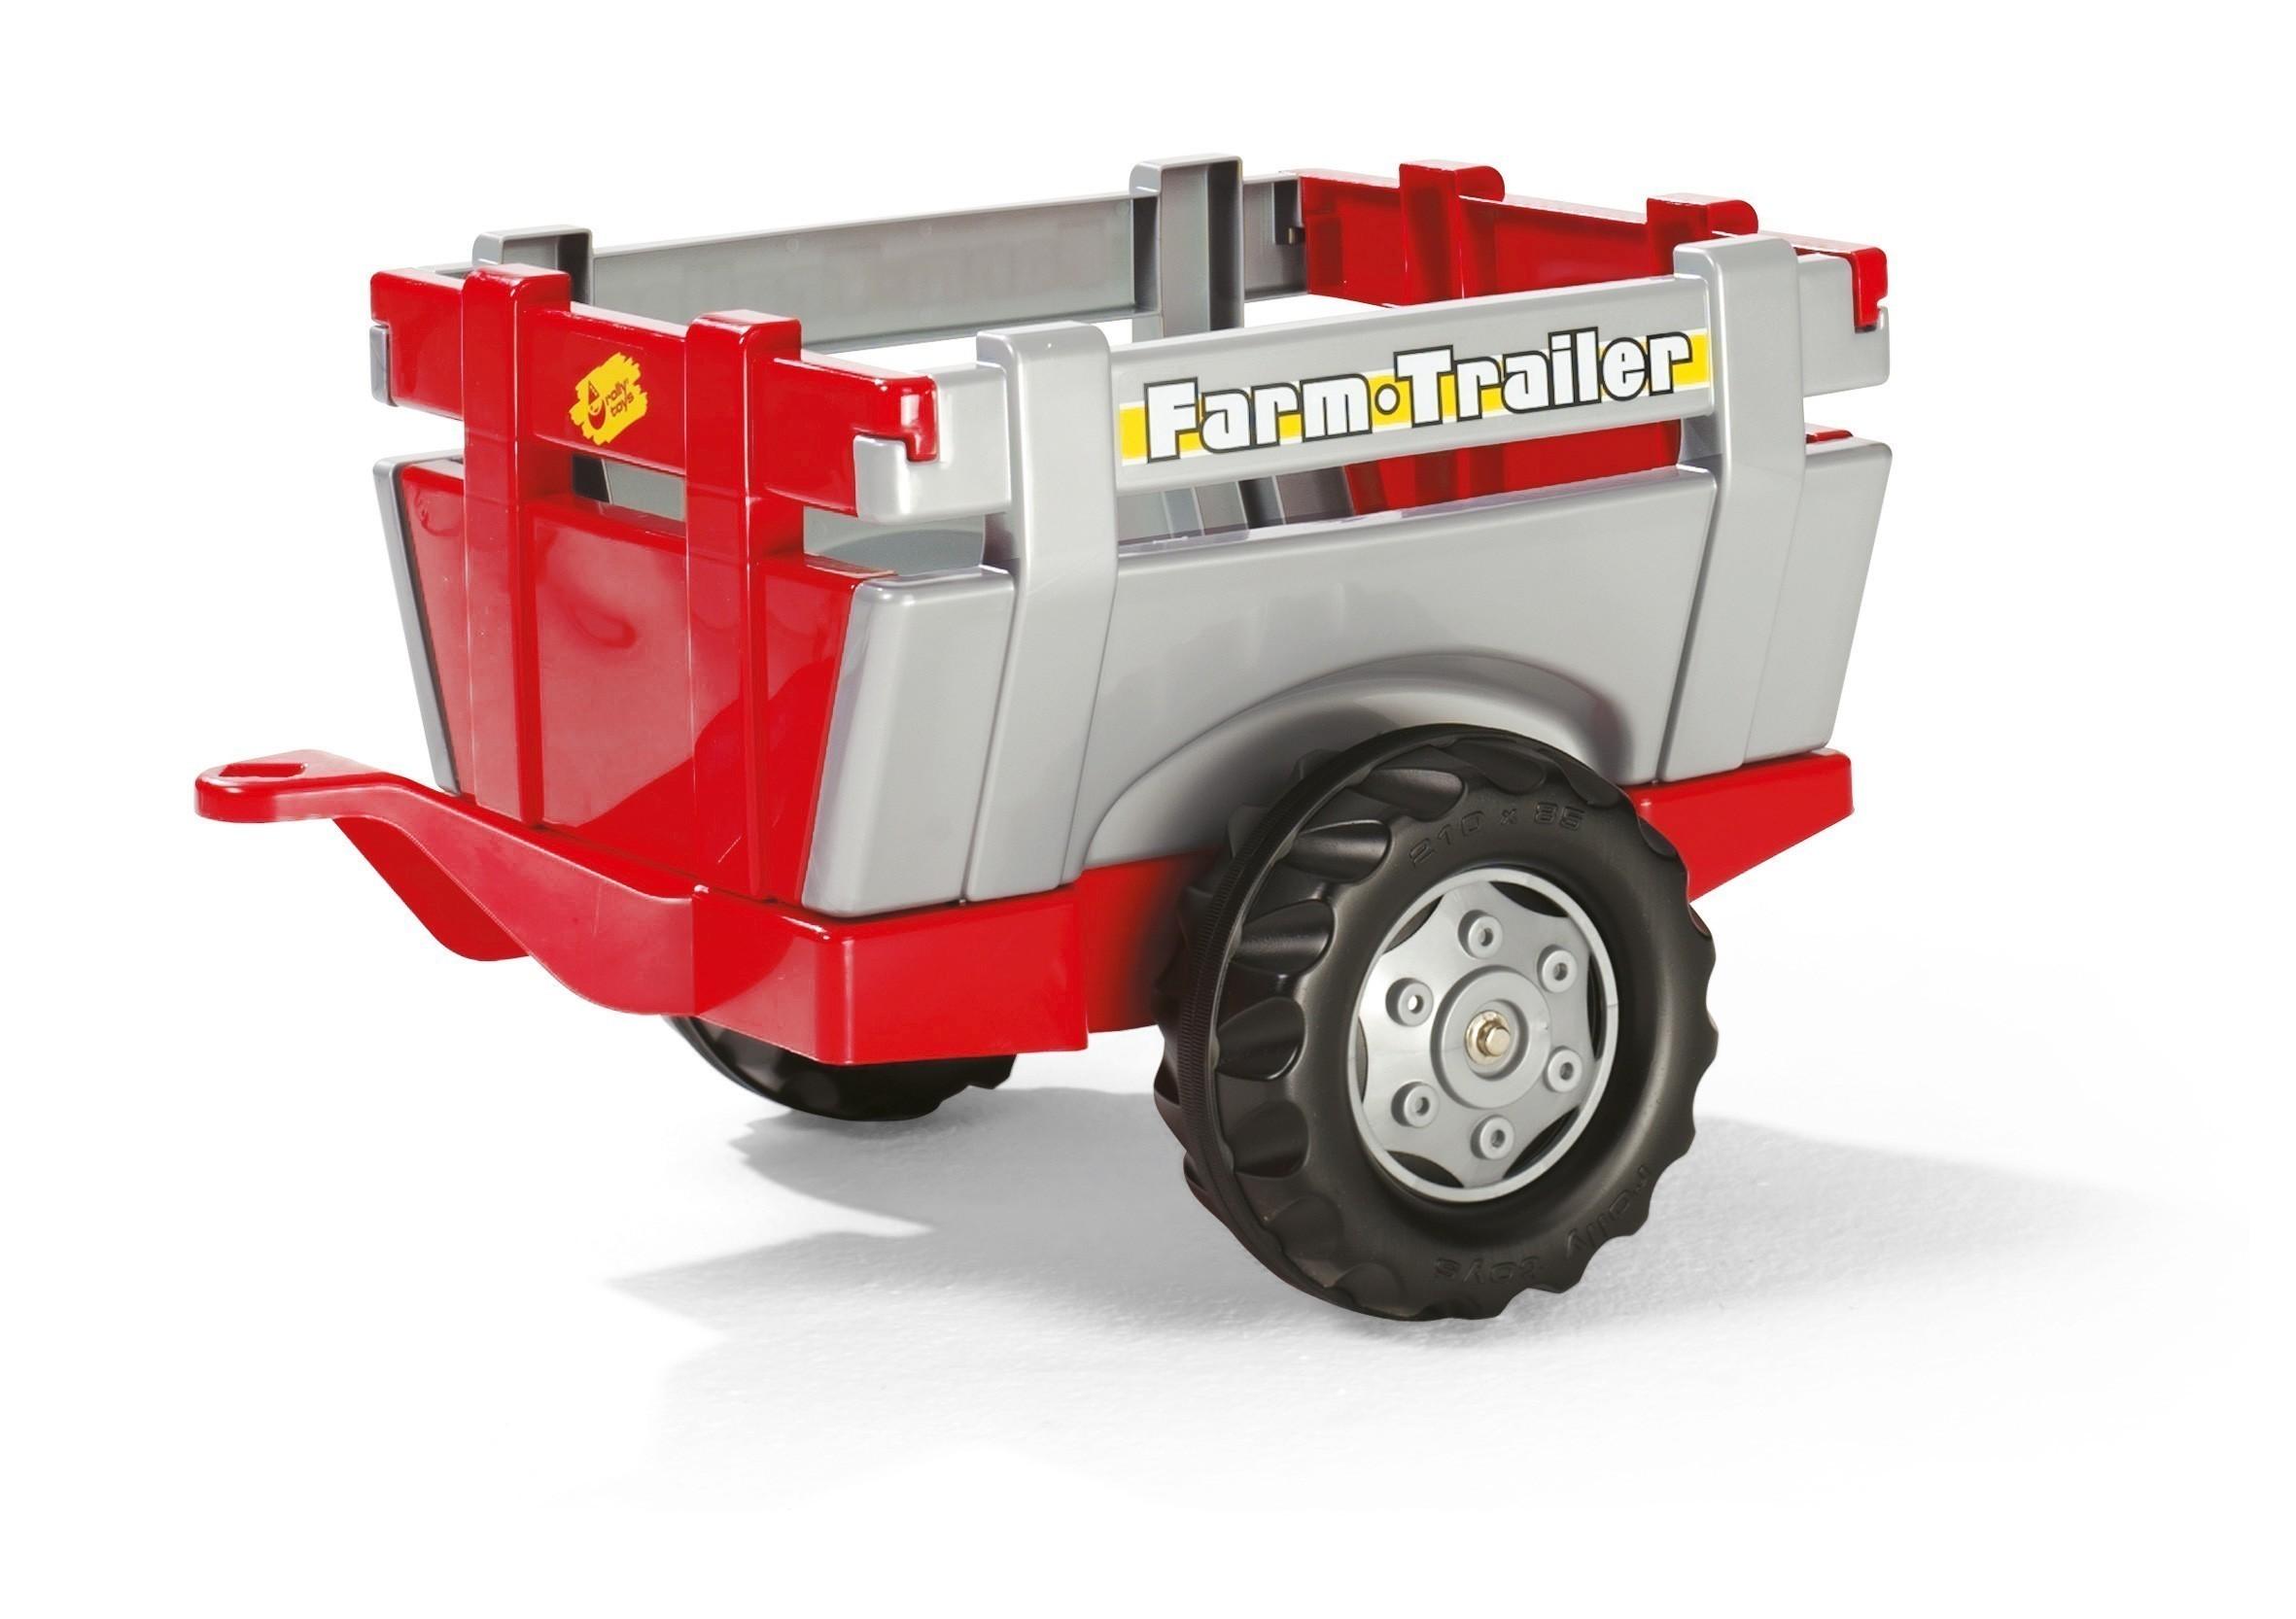 Anhänger für Tretfahrzeuge rolly Farm Trailer rot-silber - Rolly Toys Bild 1